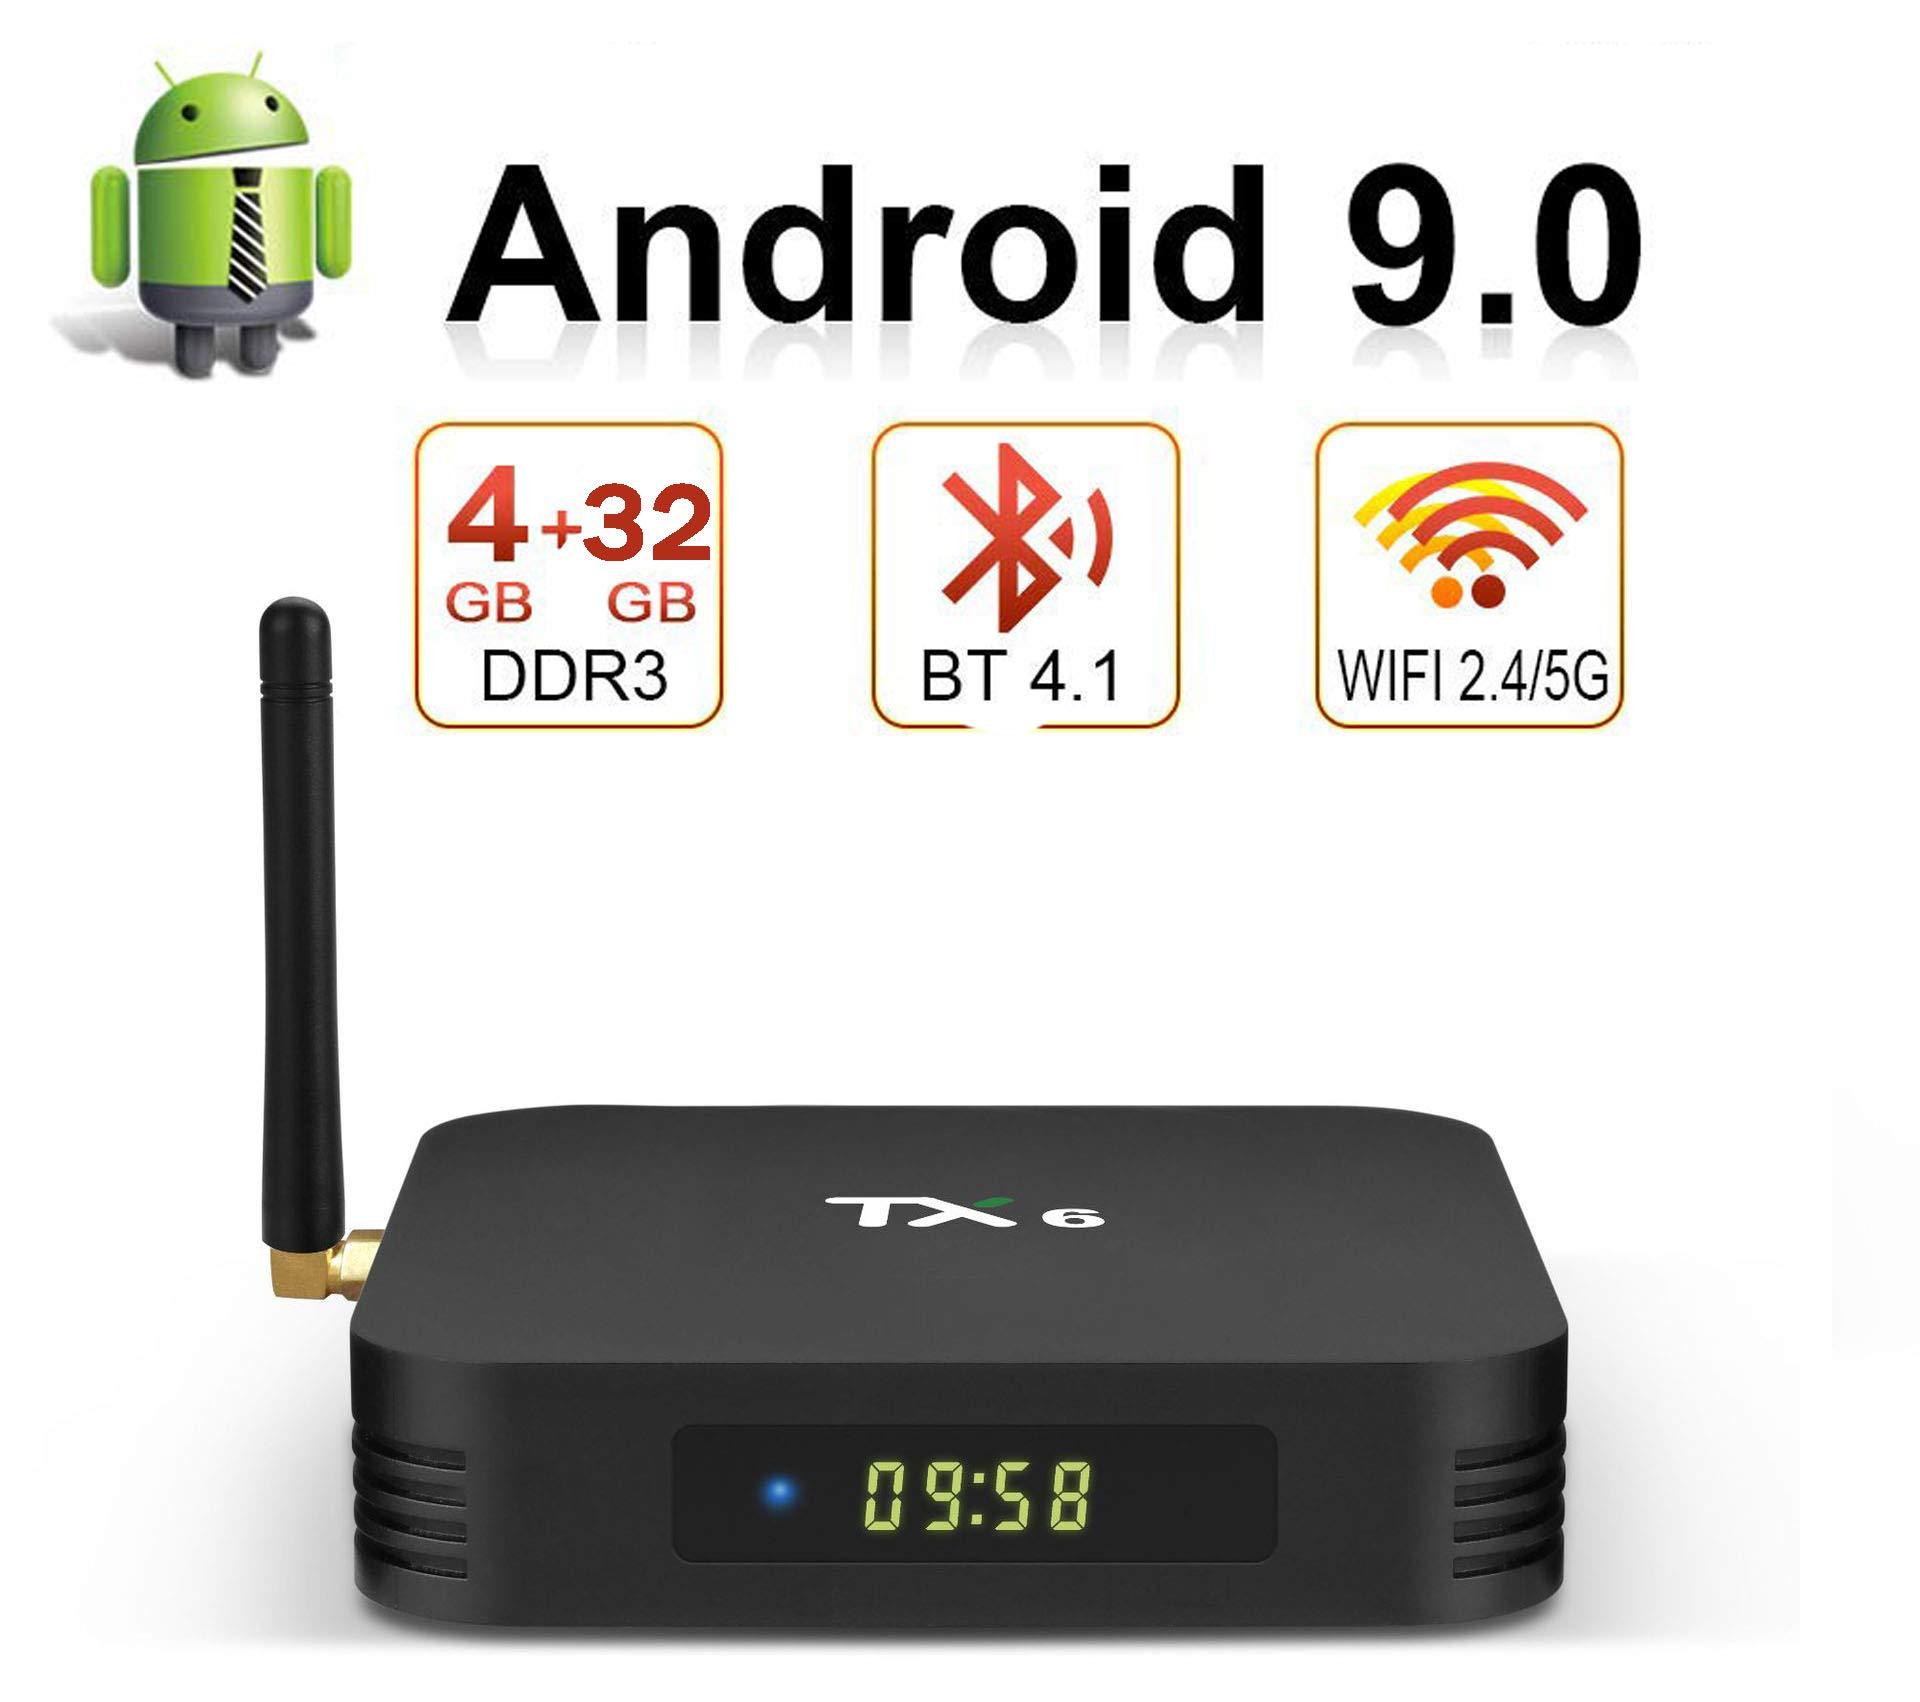 Bqeel Android 9.0TV Box B1 MAX, 4G RAM 64G Emmc, CPU H6 64-bit, Wi-FI 2.4G / 5G 100M LAN, USB 3.0 / HDMI2.1 / SPDIF, H.265 4K Smart TV Box Android,4gb+32gb: Amazon.es: